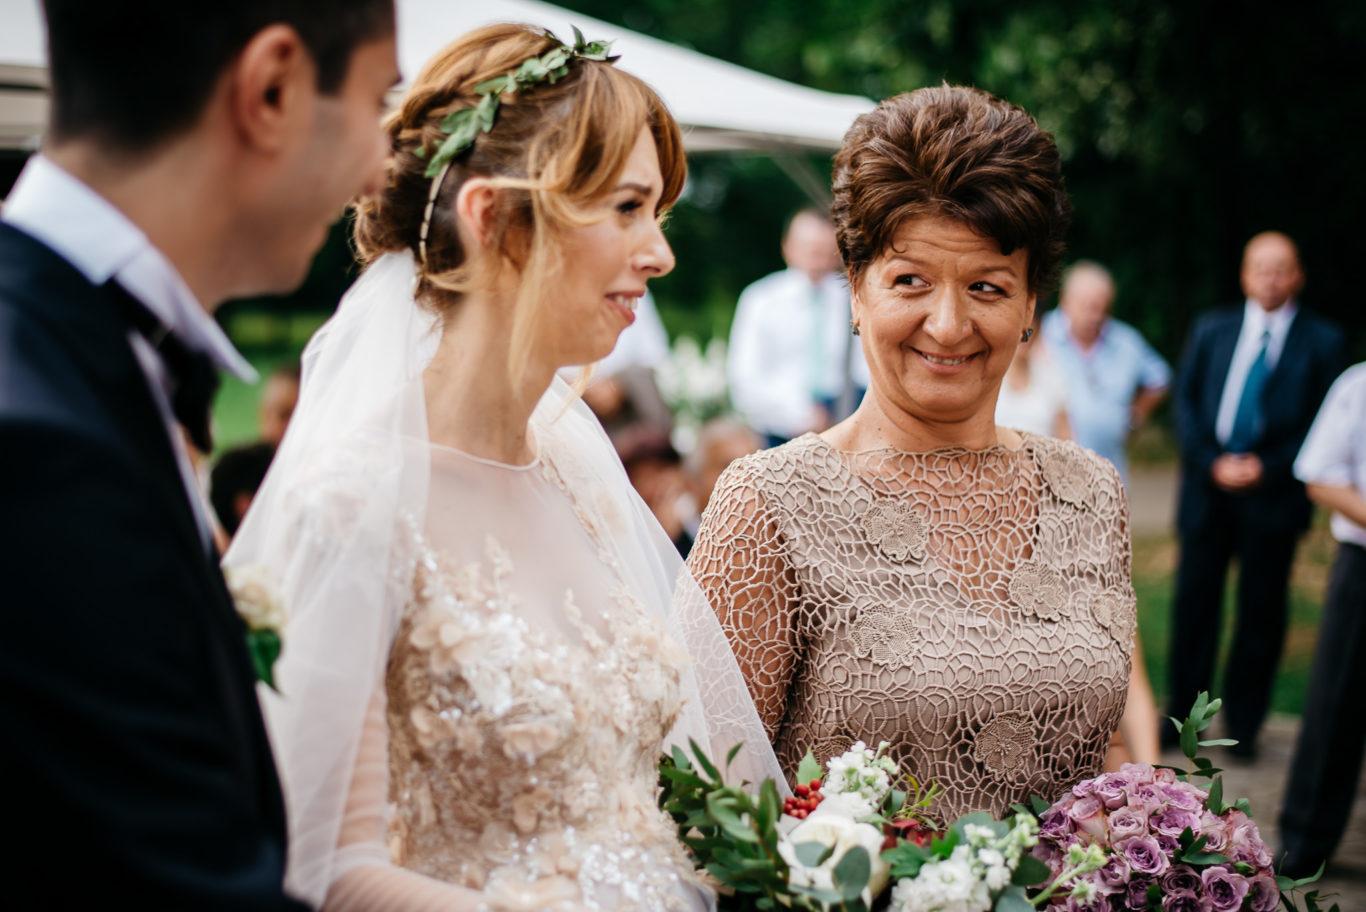 0336-Fotografie-nunta-Stirbey-Laura-Rares-fotograf-Ciprian-Dumitrescu-DSC_6843